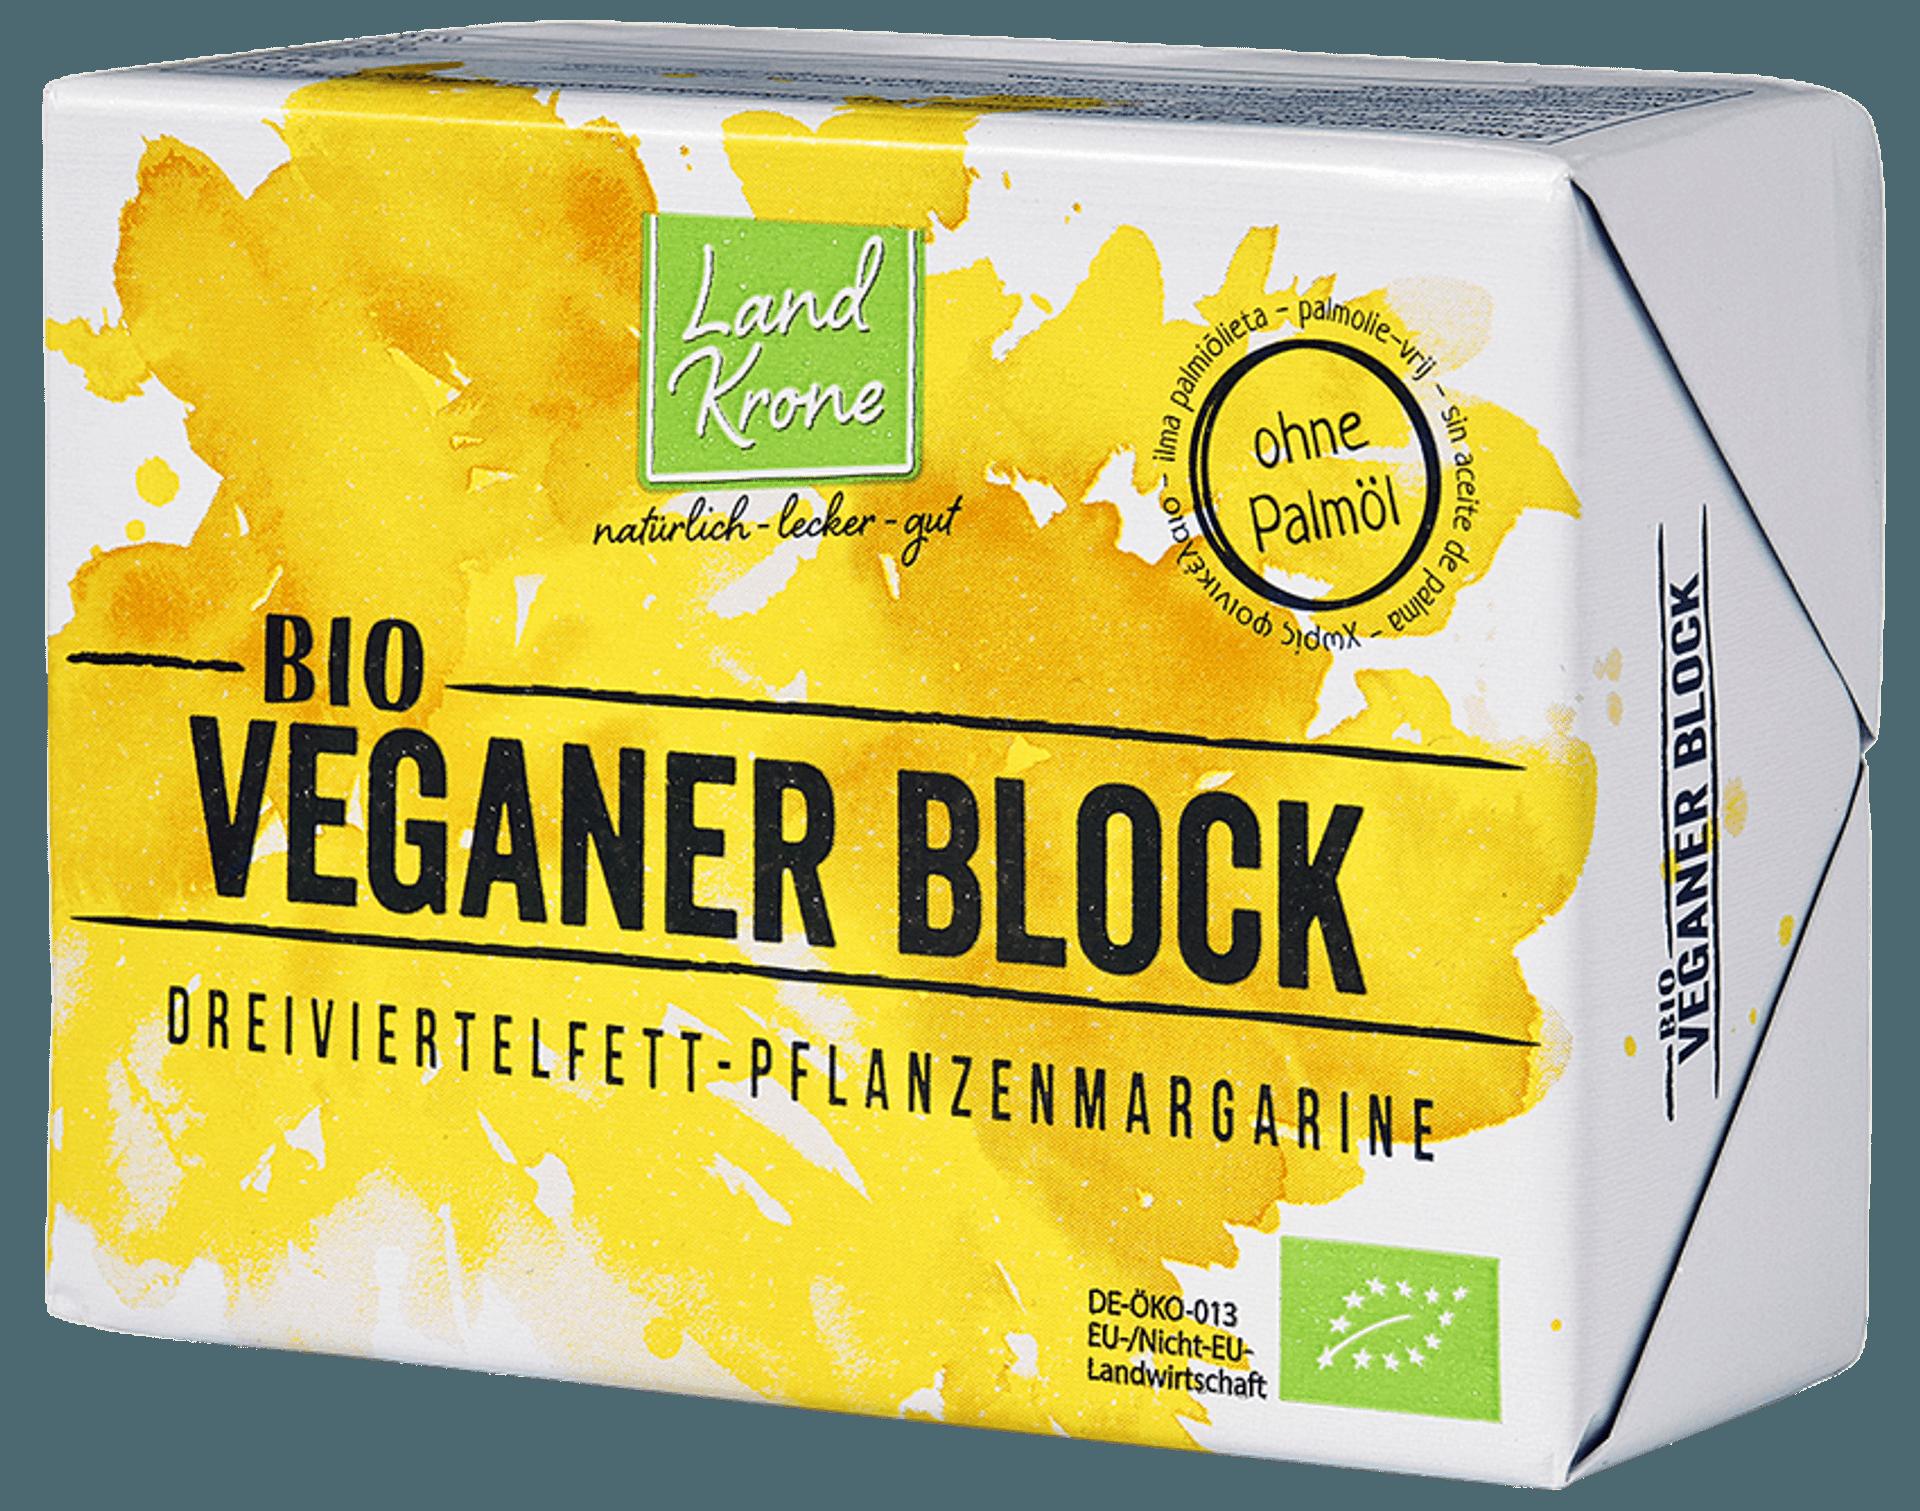 Veganer Block Pflanzenmargarine